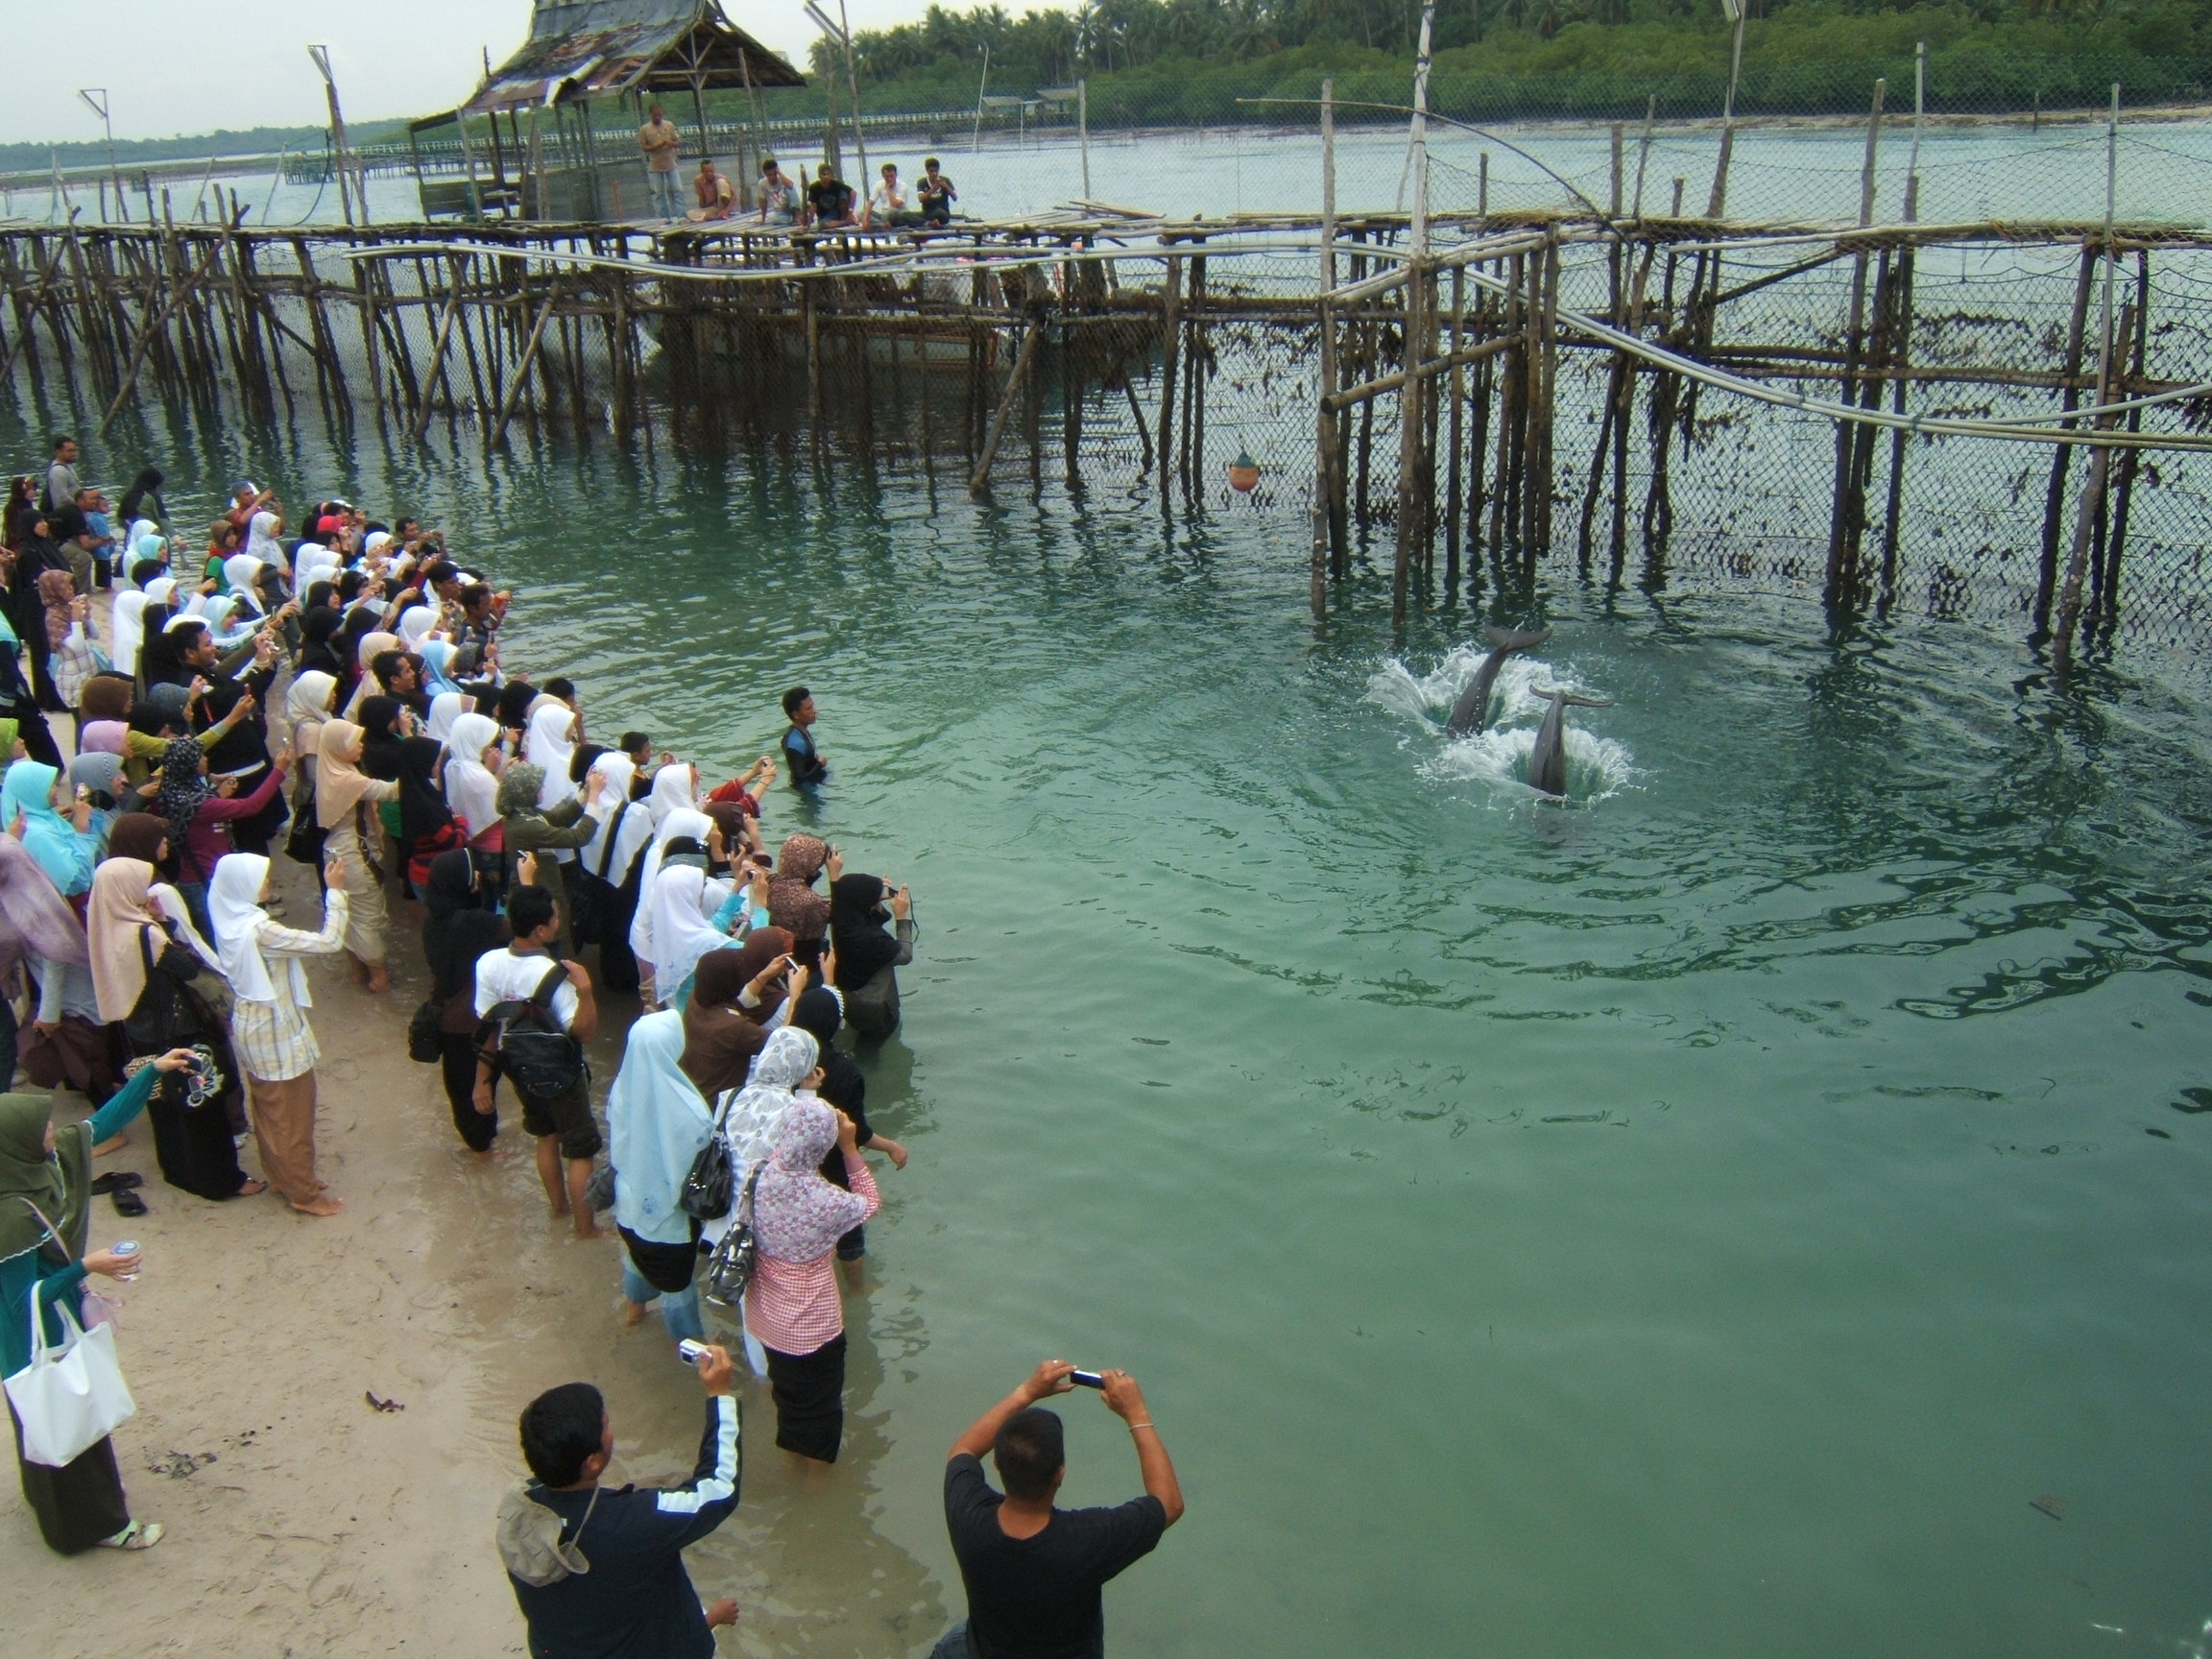 Objek wisata yang terabaikan, pelantar tempat pengunjung melihat atraksi dolphin2 jinak itu pun sudah reot tak terurus lagi, hanya tinggal mengevakuasi kelima ekor dolphin yang tinggal di perairan pulau Mencadas itu , rencana hendak di bawa ke Bali